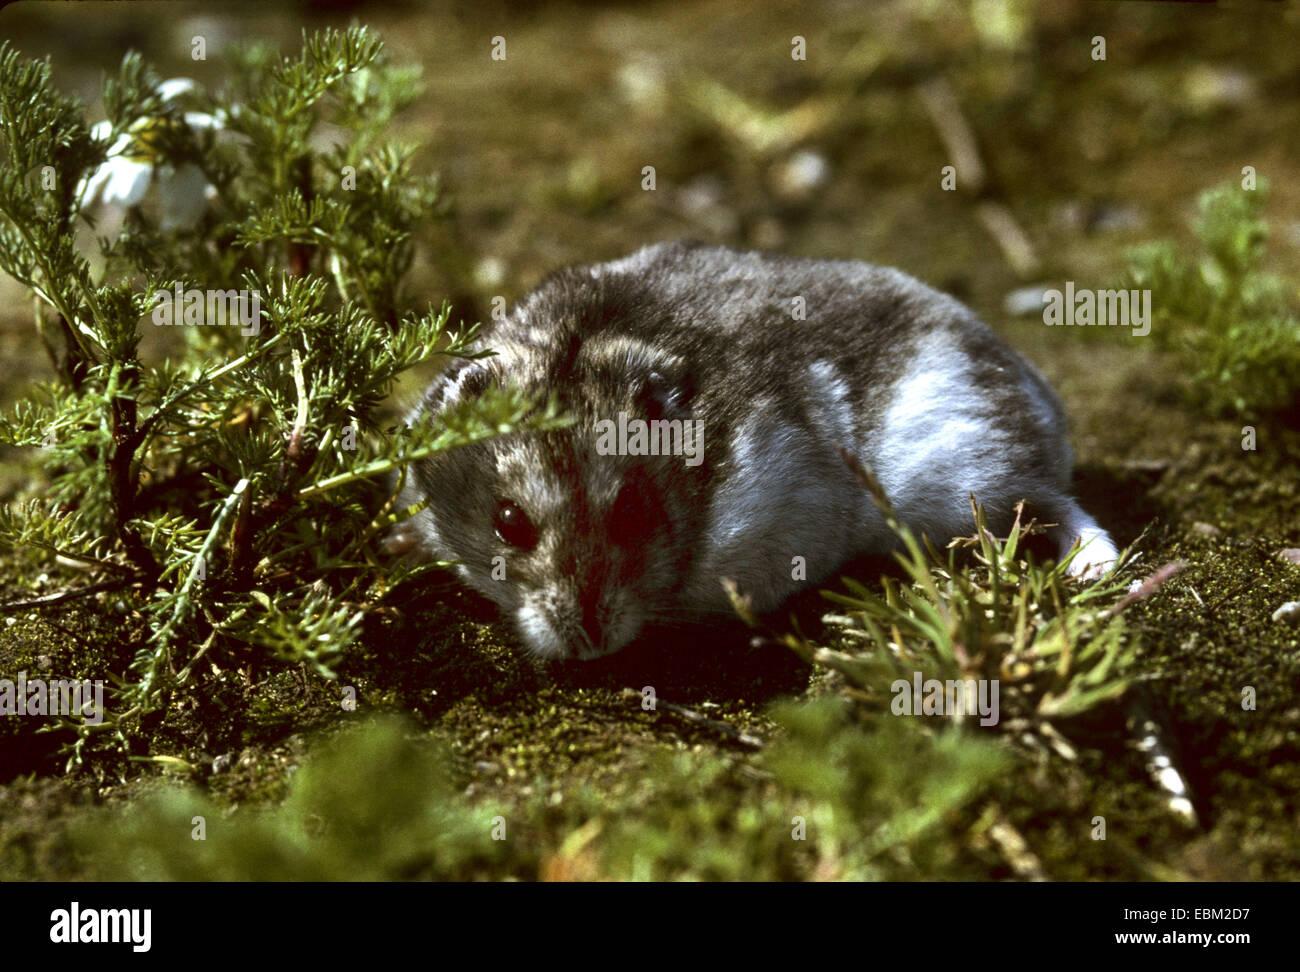 Bar rayé à pattes velues, hamster hamster Dzungarian (Phodopus sungorus), portrait Photo Stock